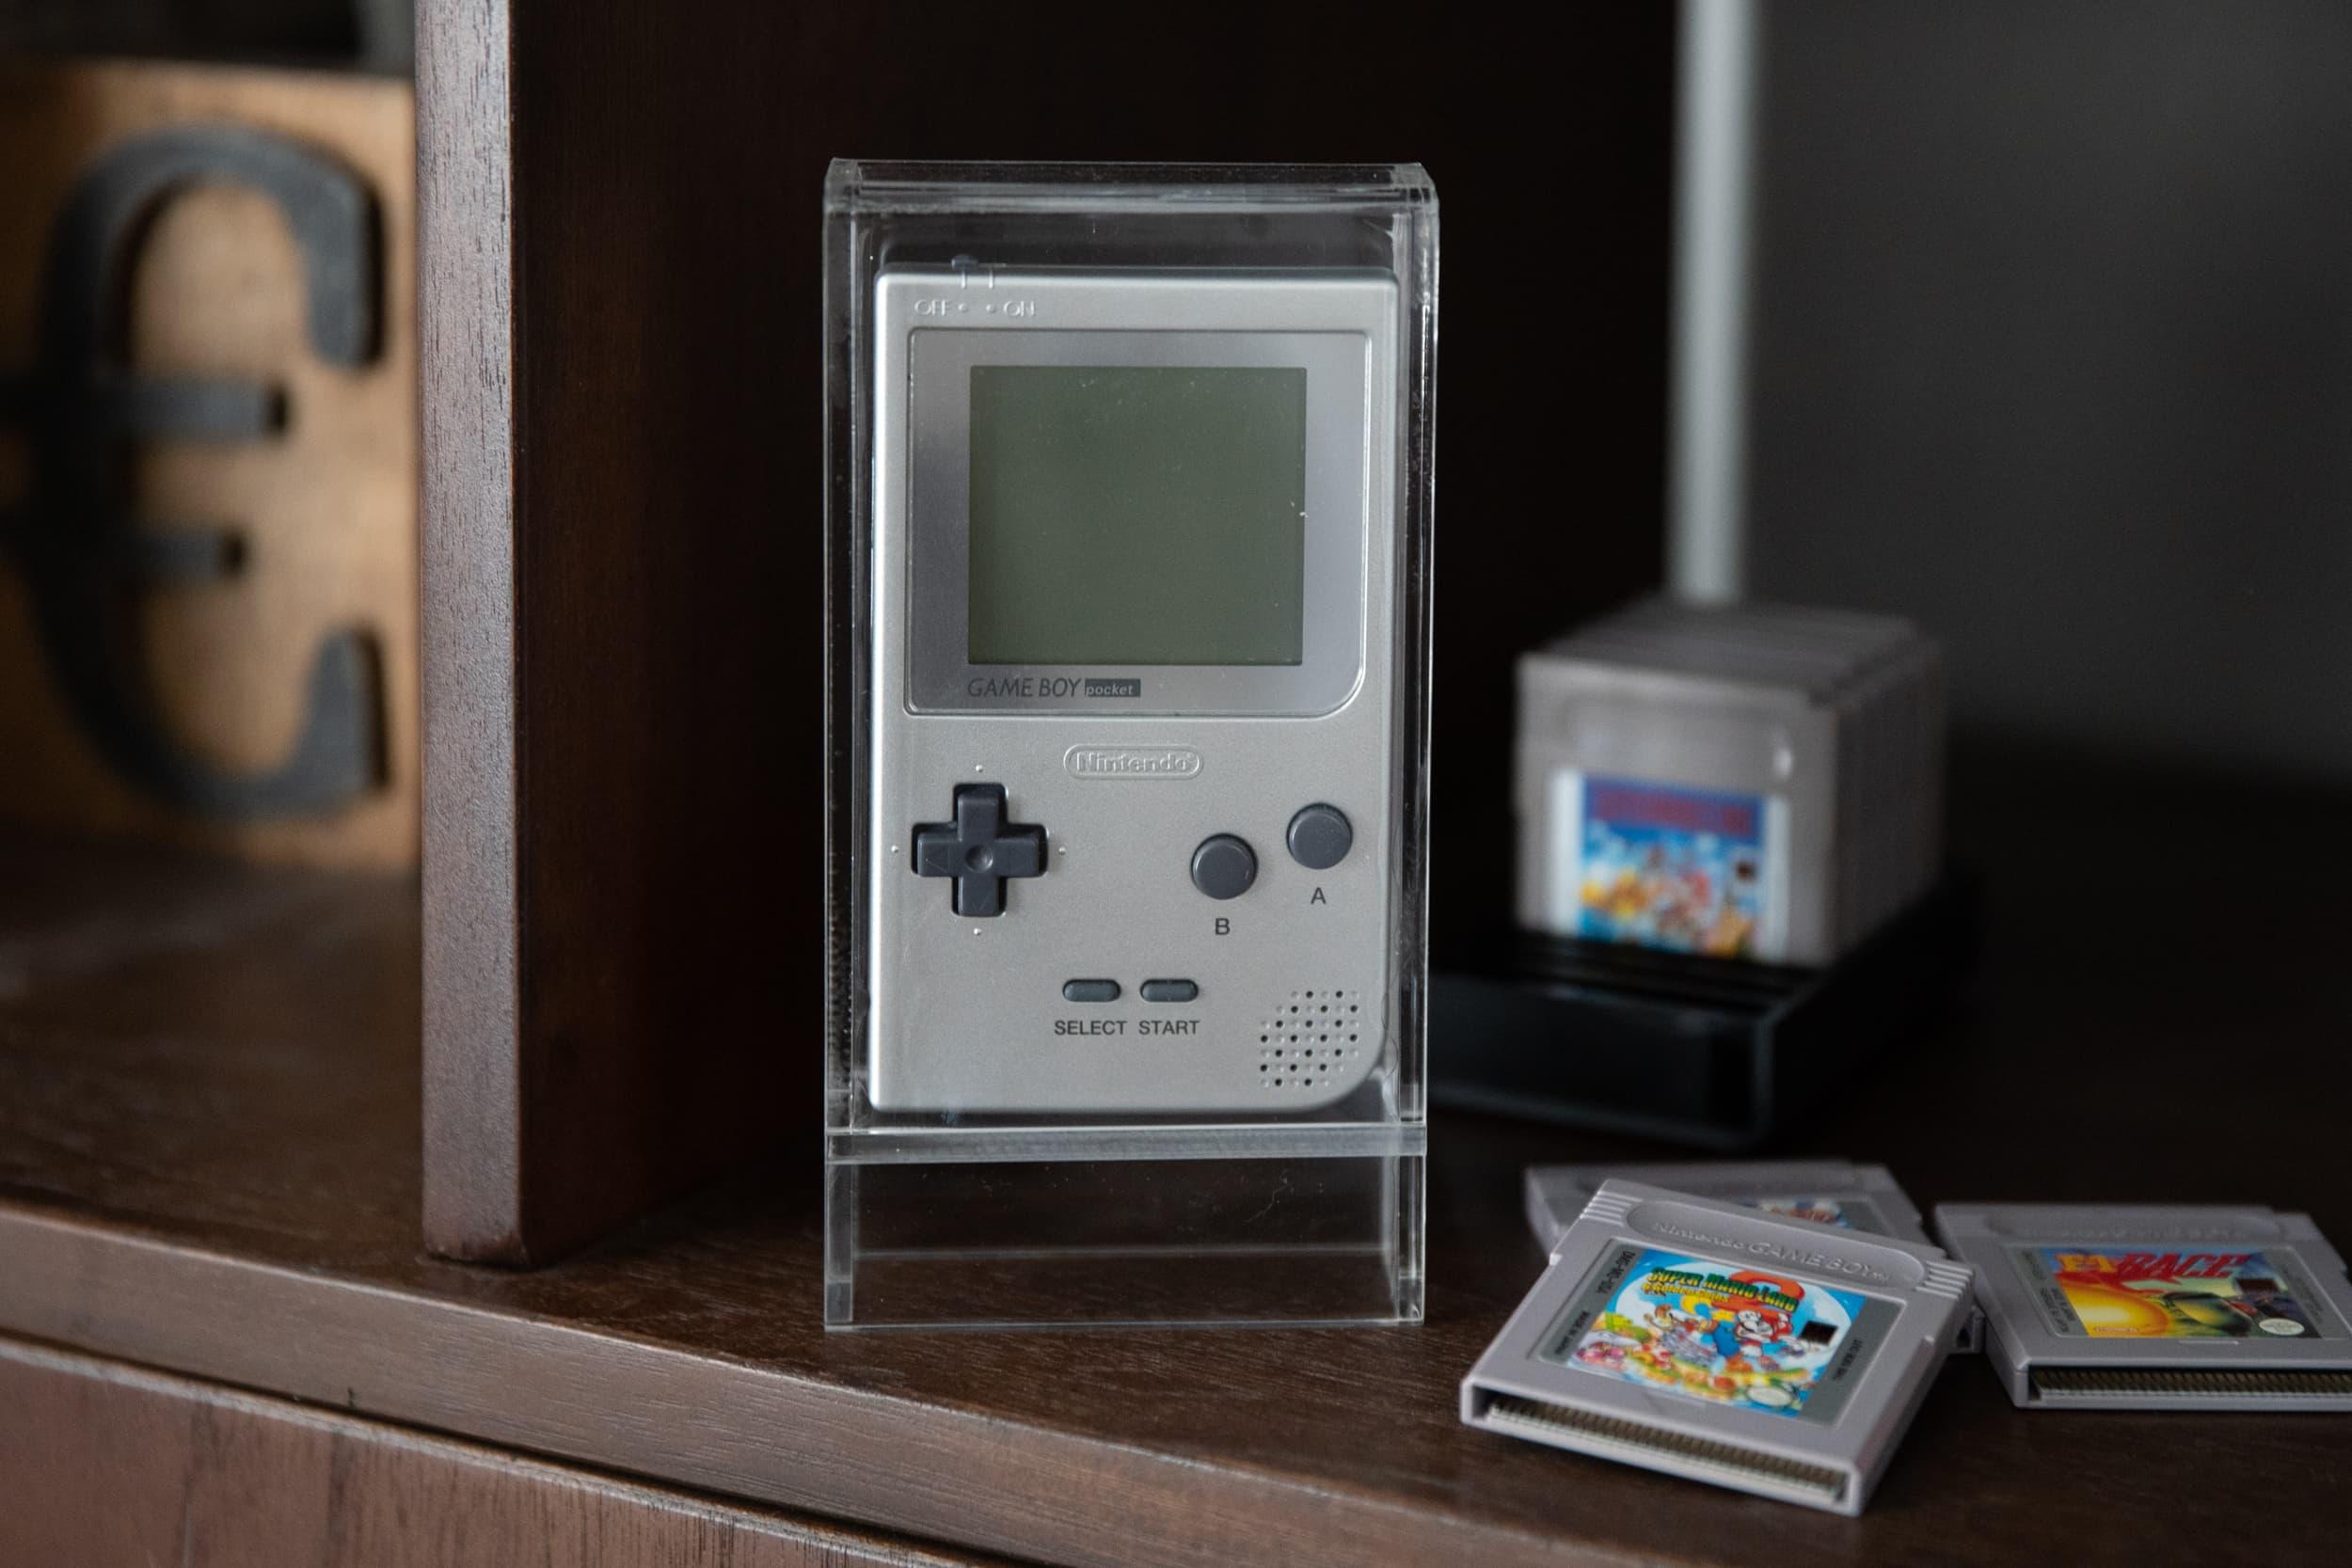 Game Boy Pocket CartVault